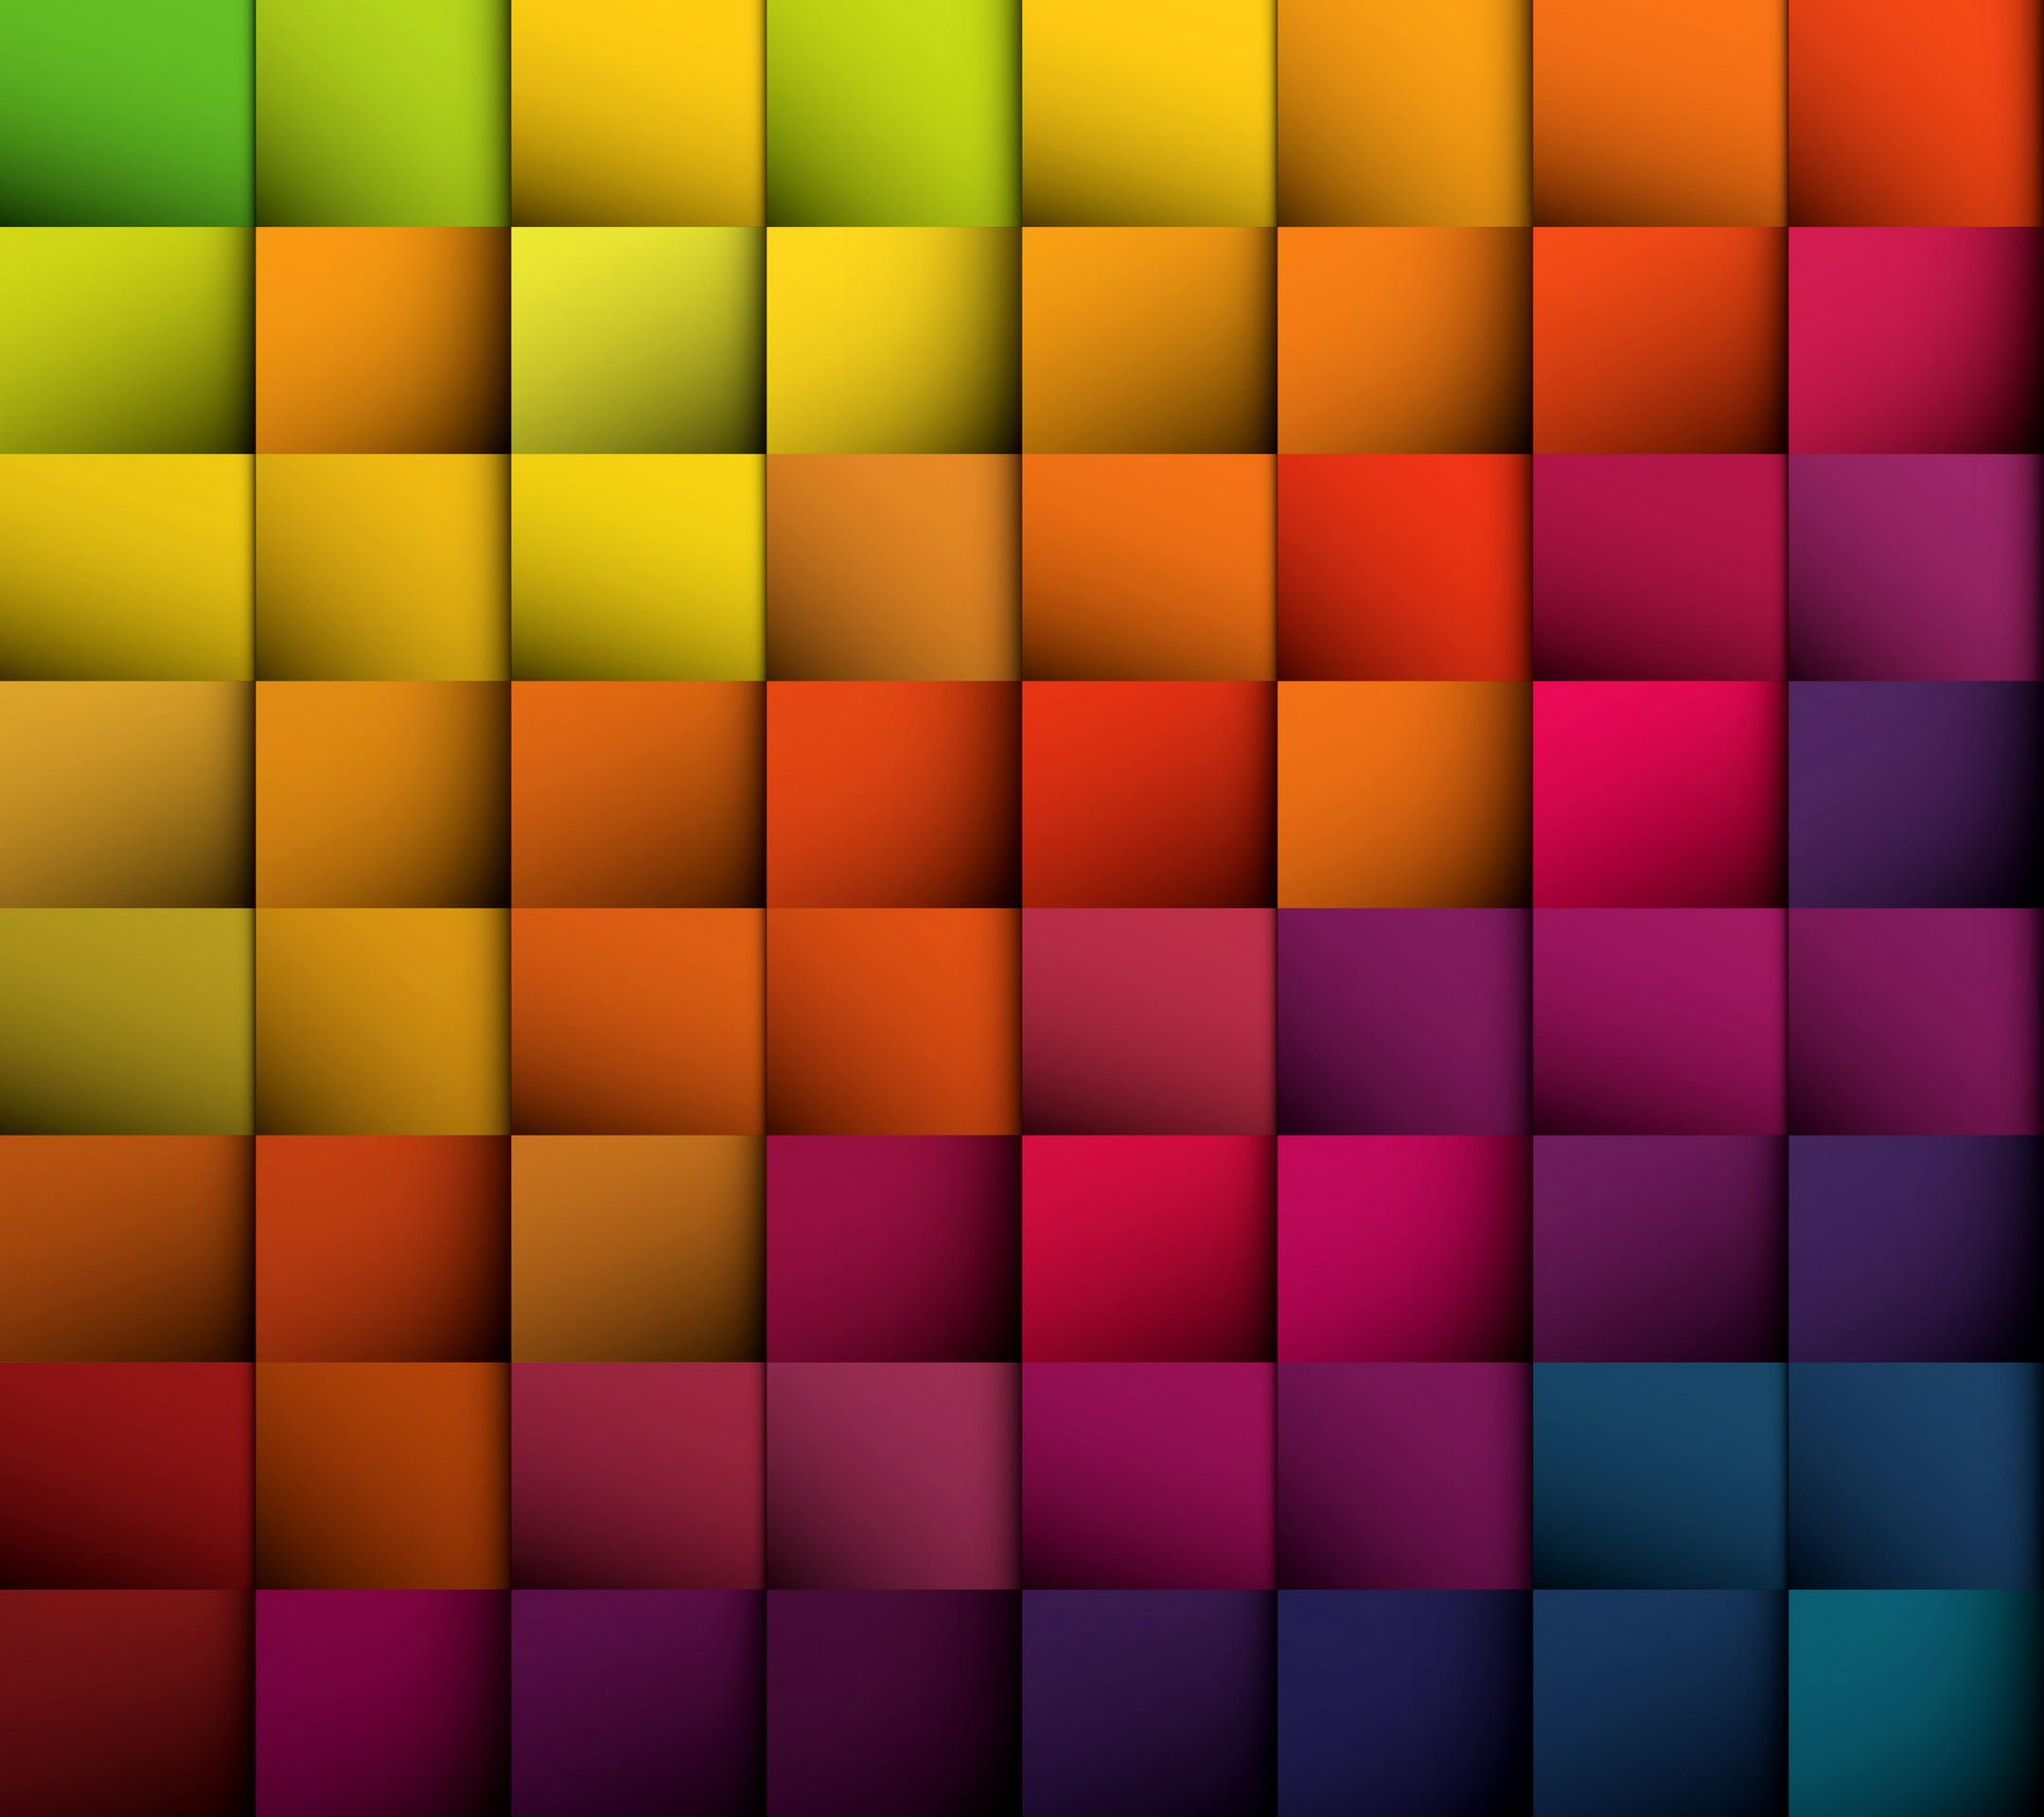 Анекдоты картинках, картинки с квадратами